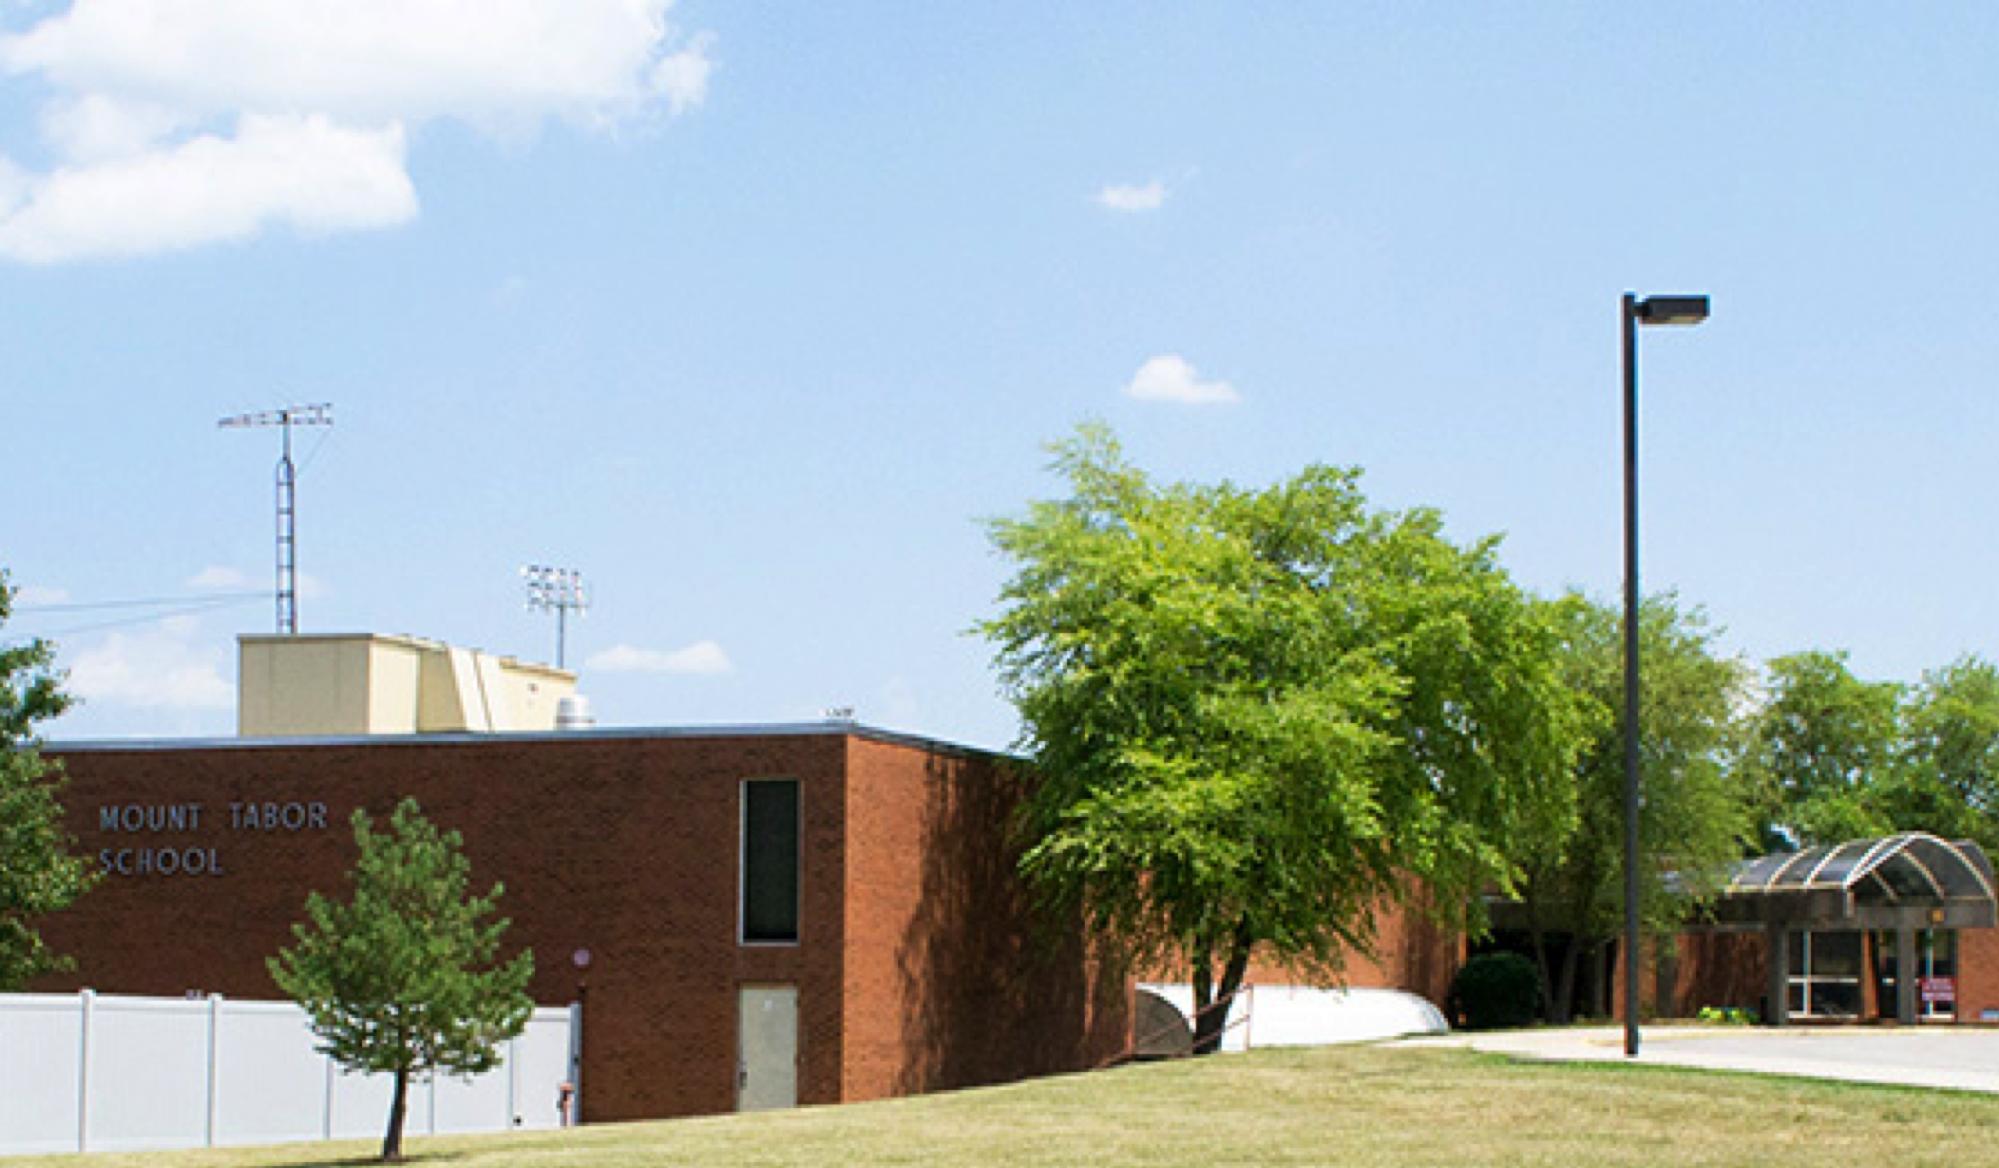 Mount Tabor Elementary School